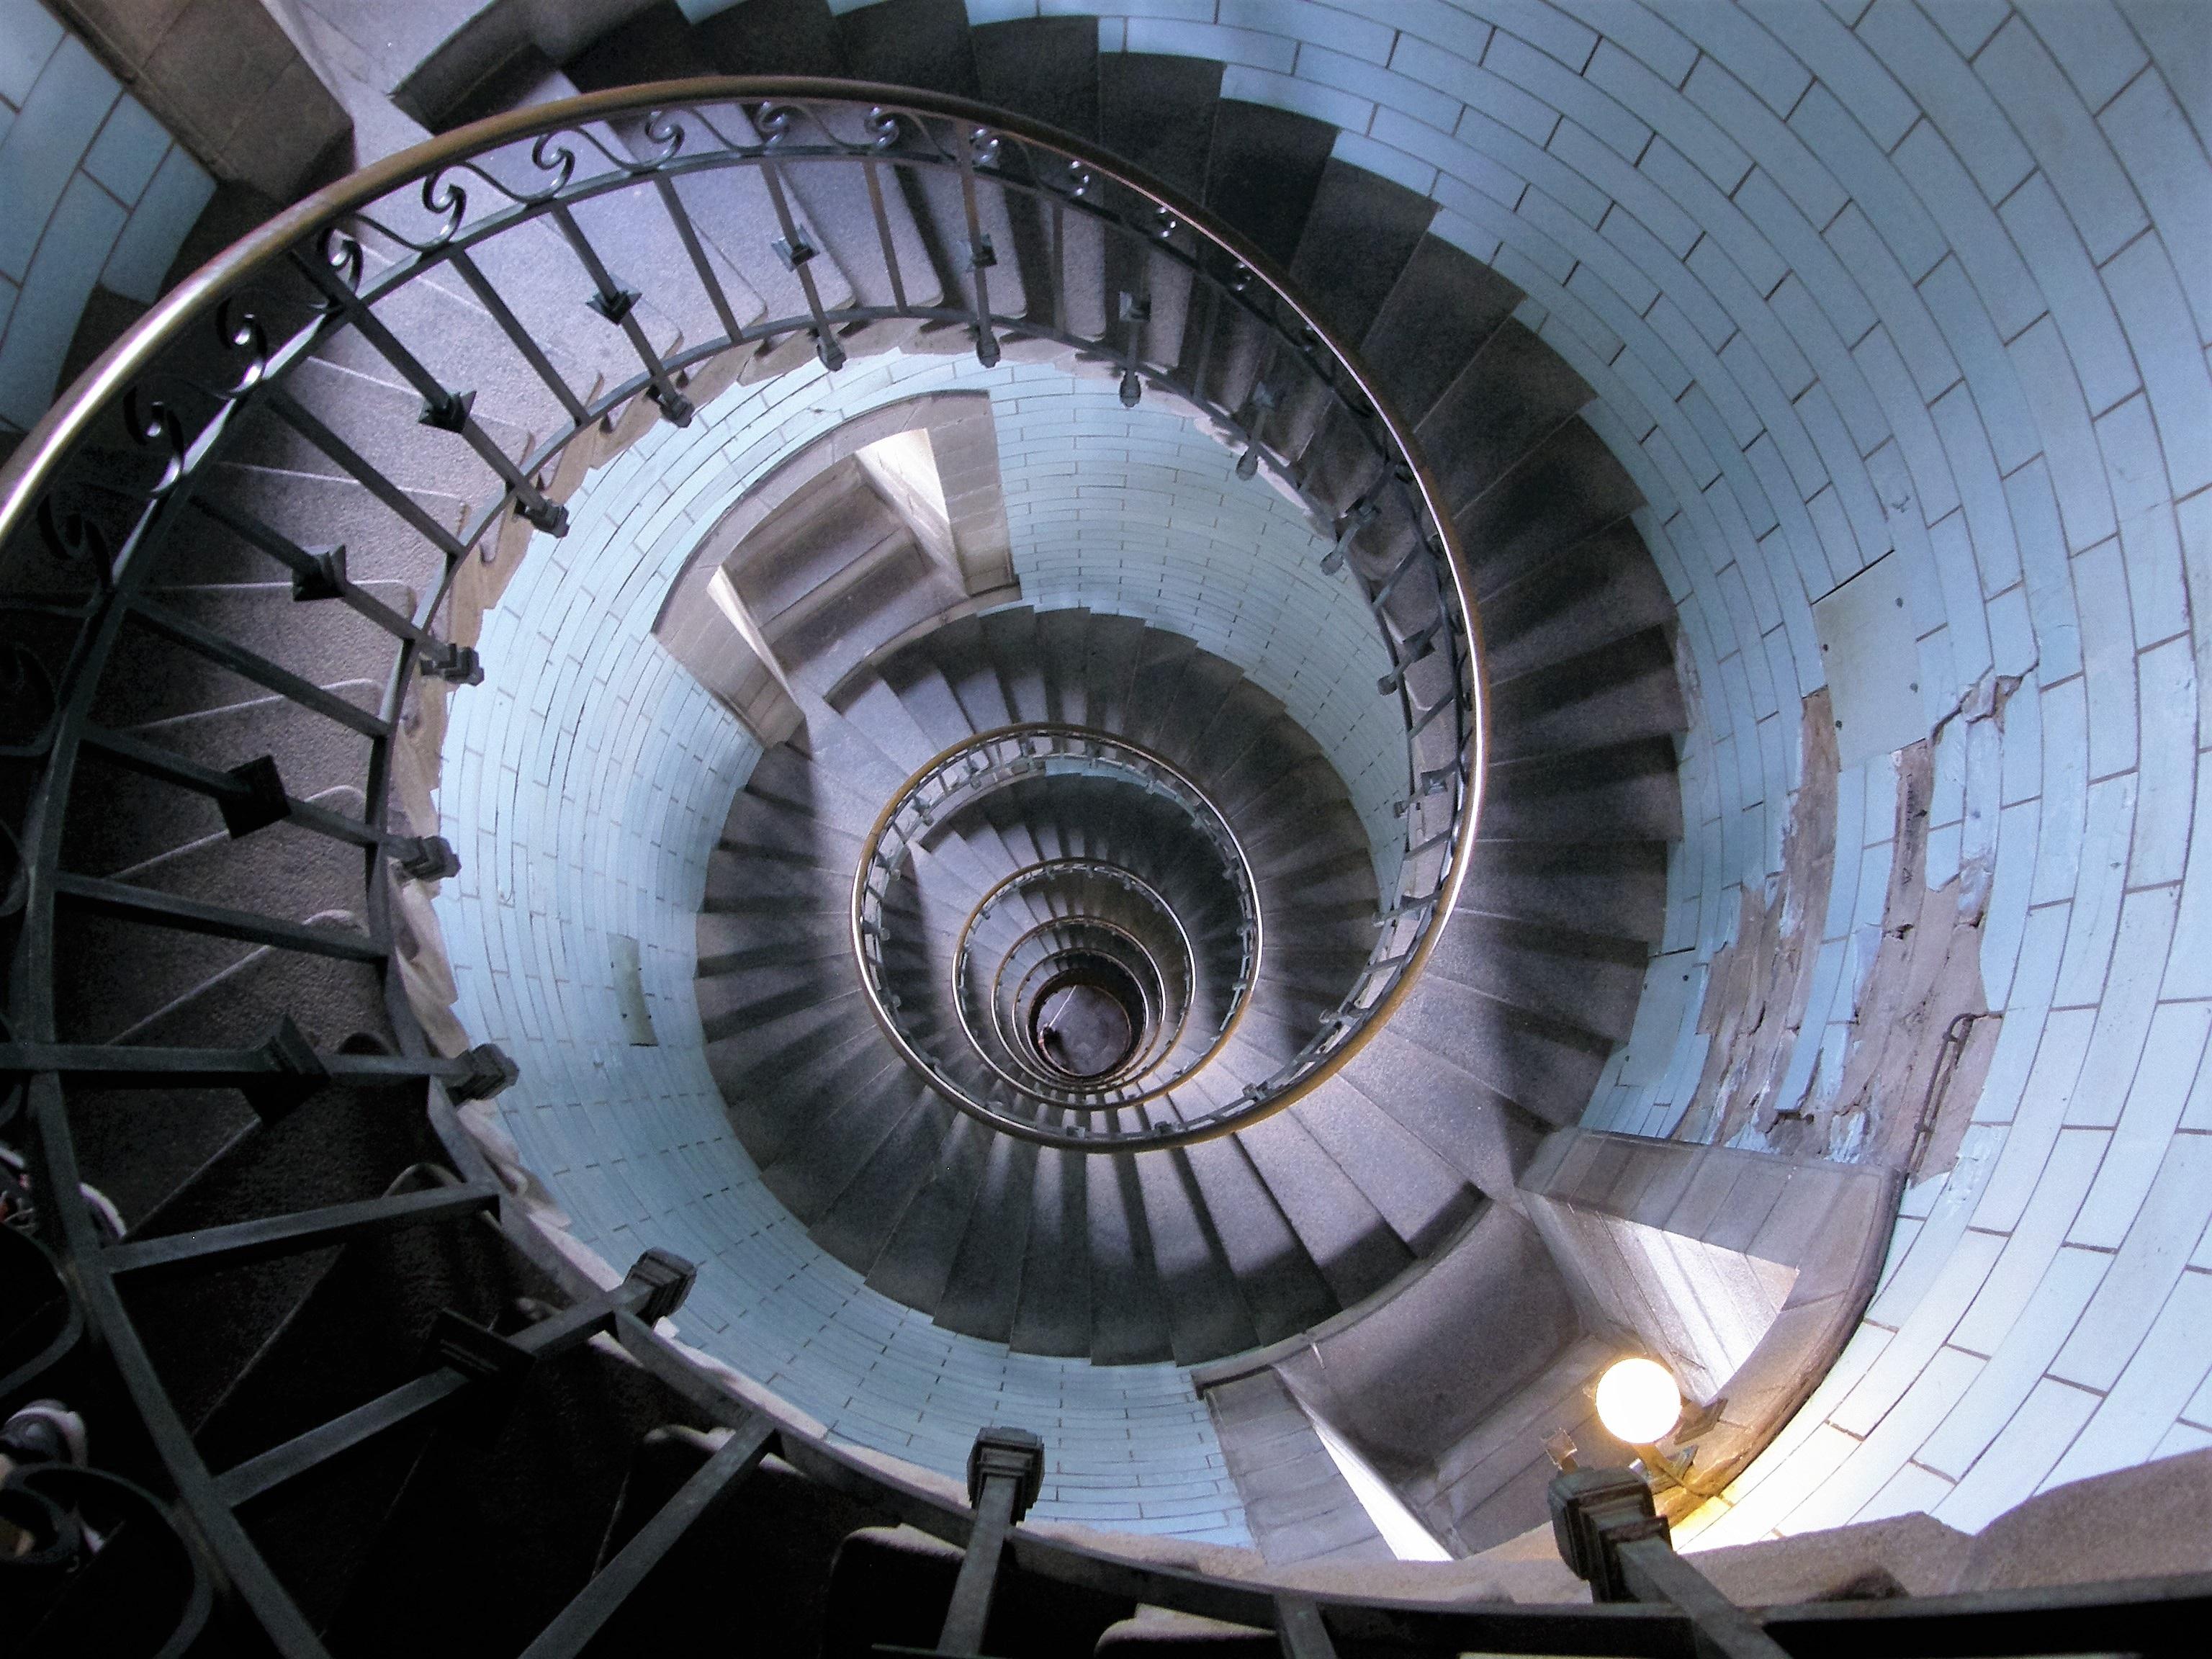 faro rueda espiral escalera barandilla habl neumtico turbina escalera de caracol escalera borde motor a reaccin